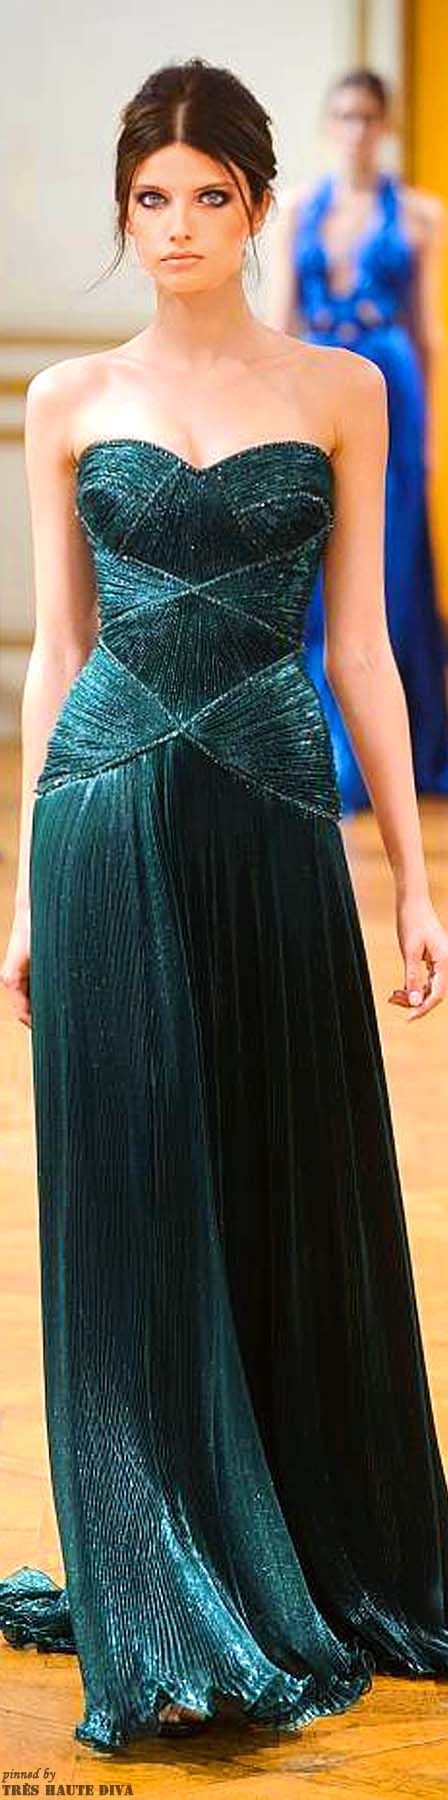 Zuhair Murad Haute Couture Autumn/Winter 2013